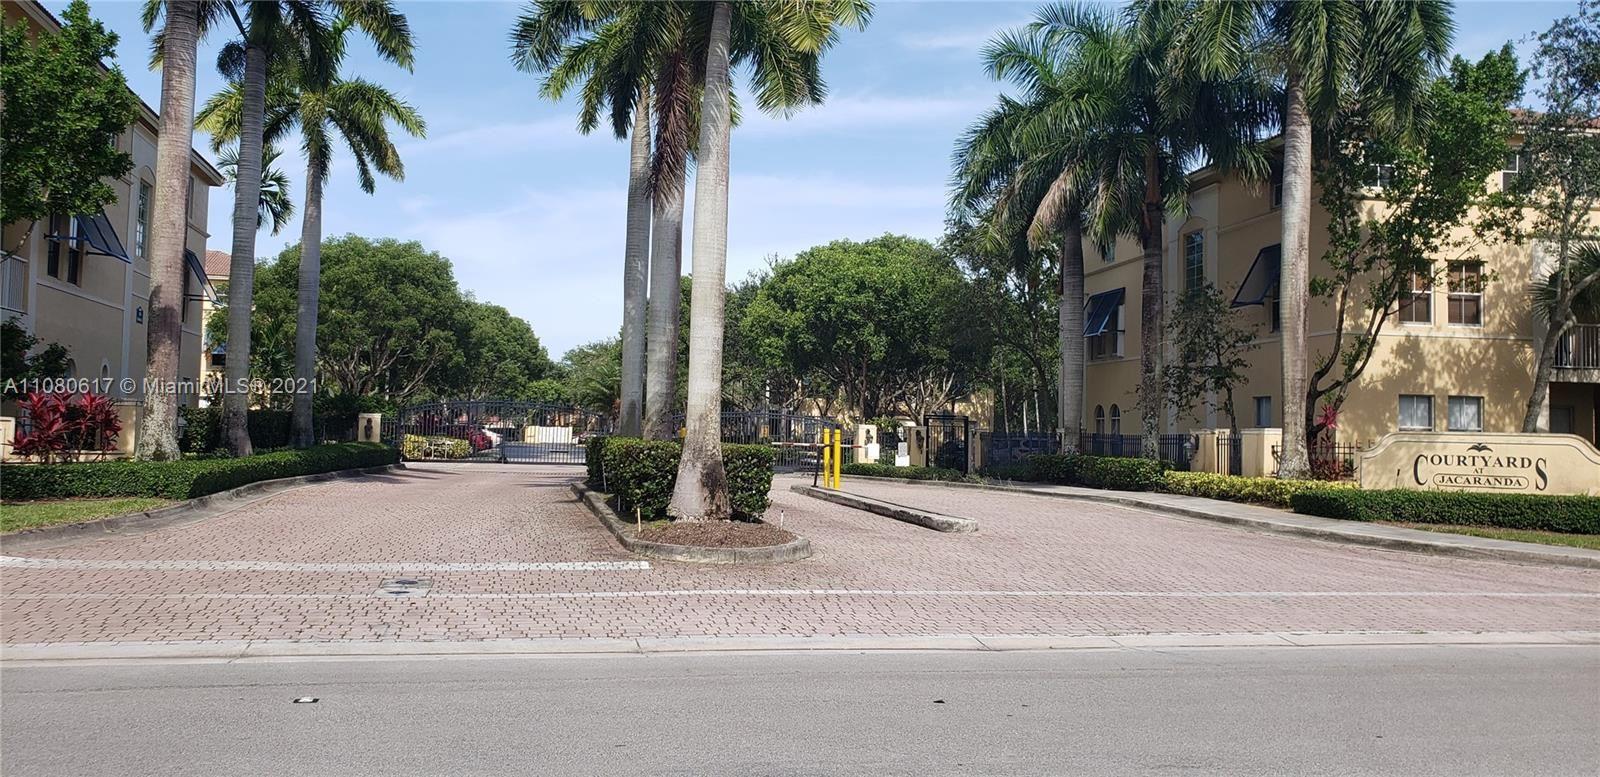 120 Jacaranda Country Club Dr #101, Plantation, FL 33324 - #: A11080617